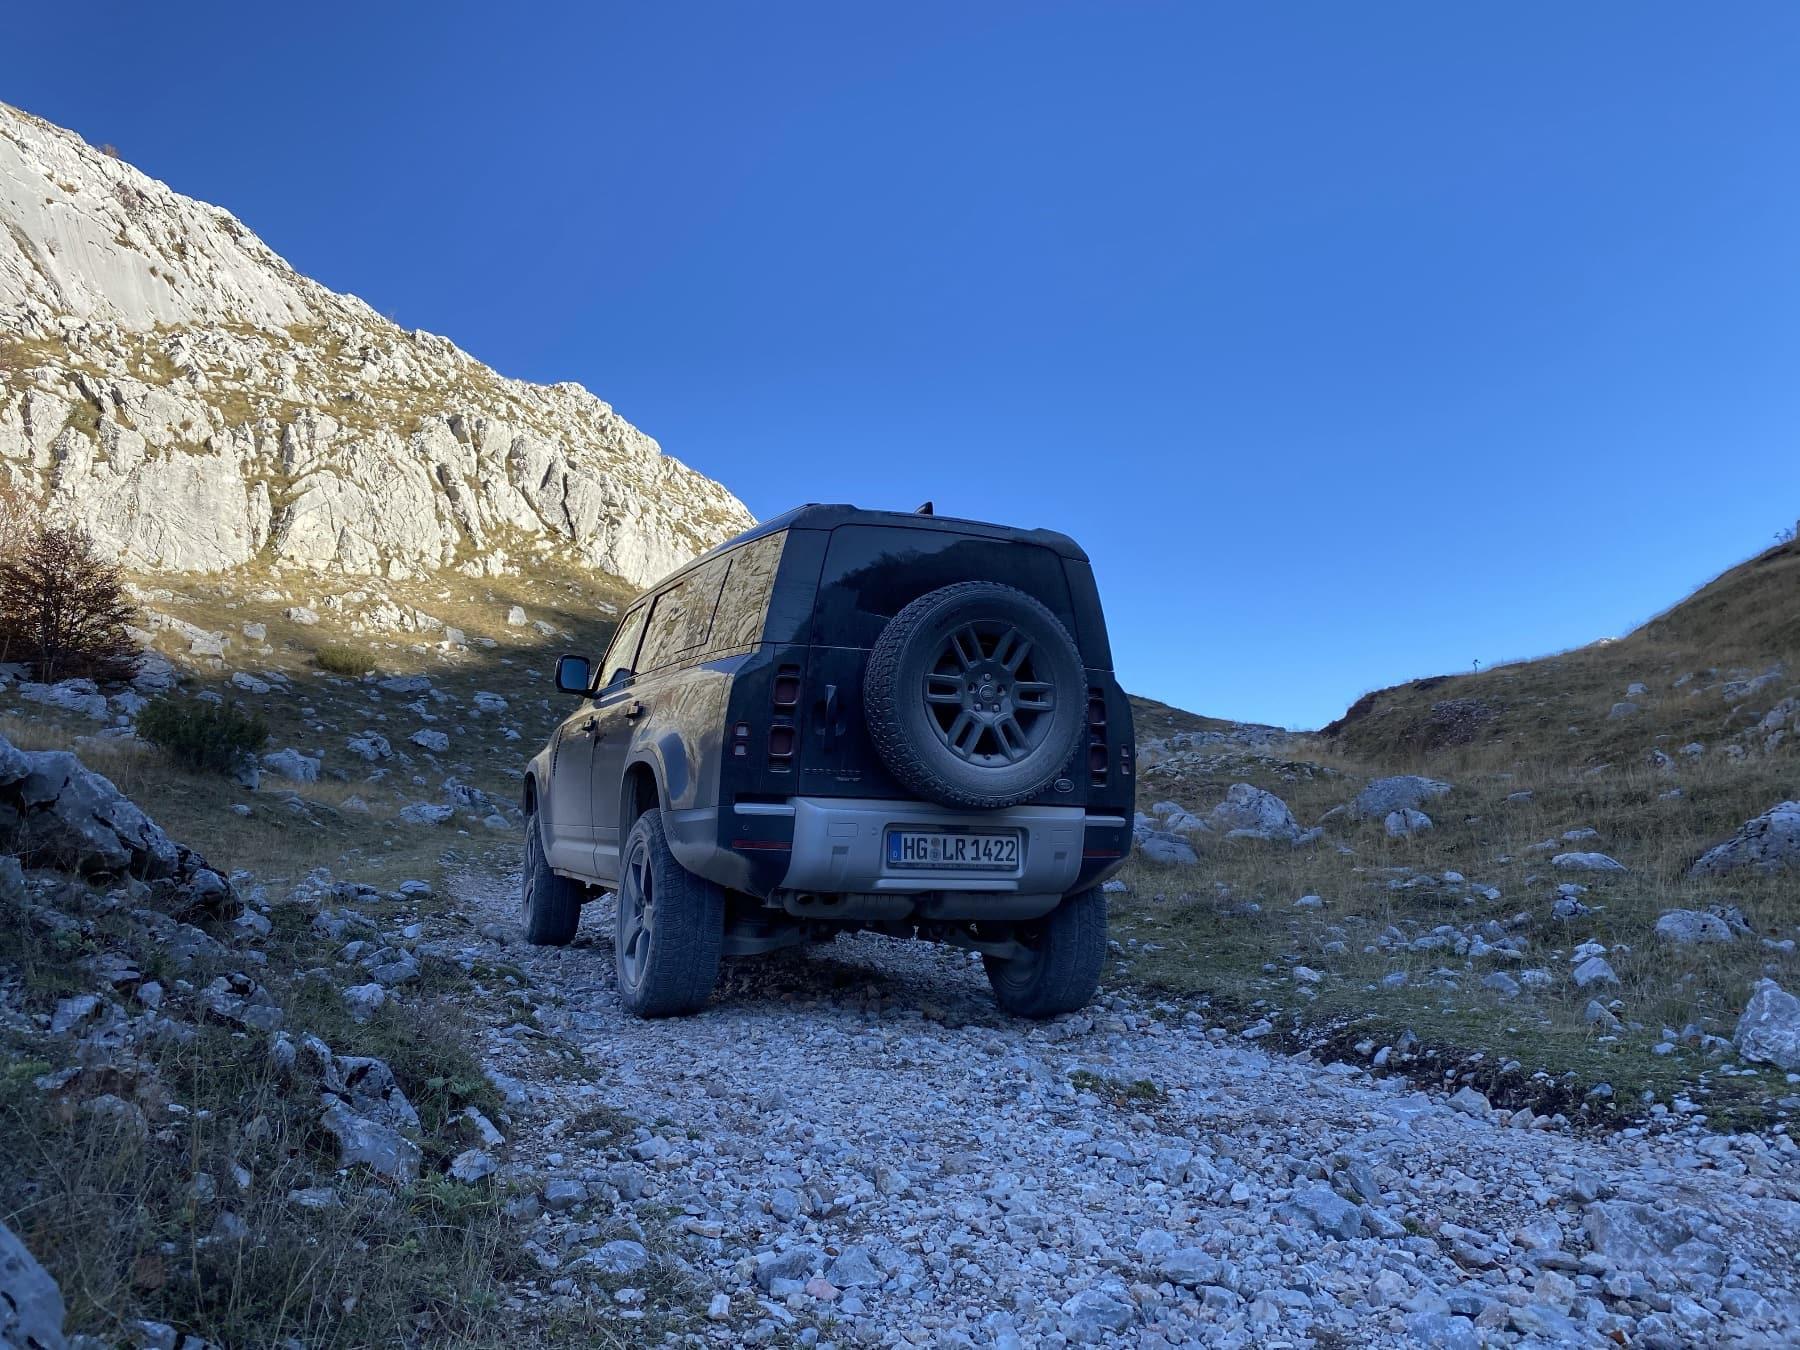 Mountain Village Umoljani - In Search of the Stone Dragon 1